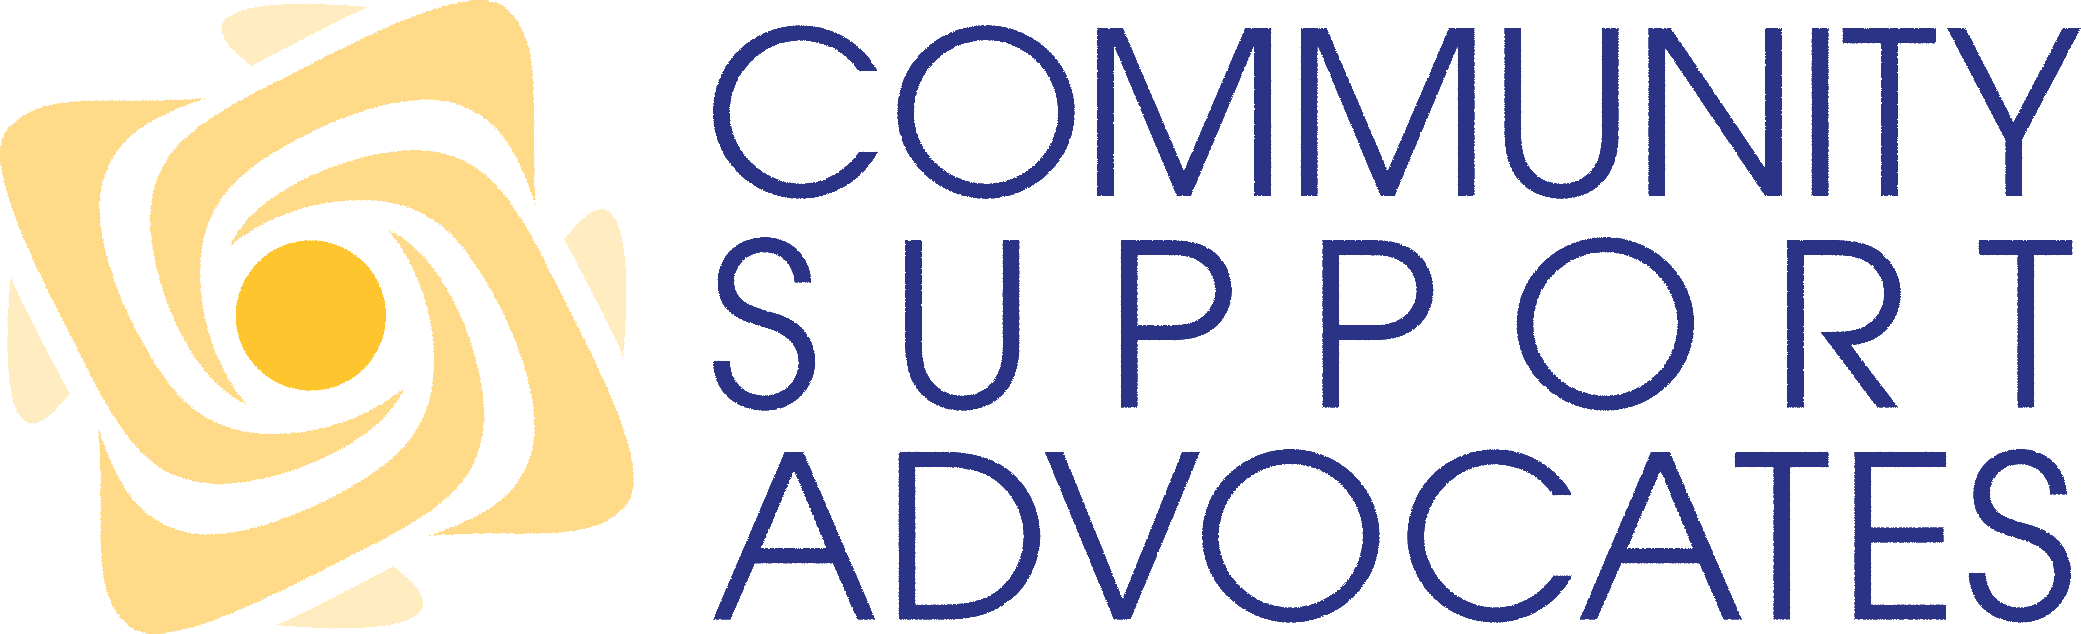 Community Support Advocates Company Logo